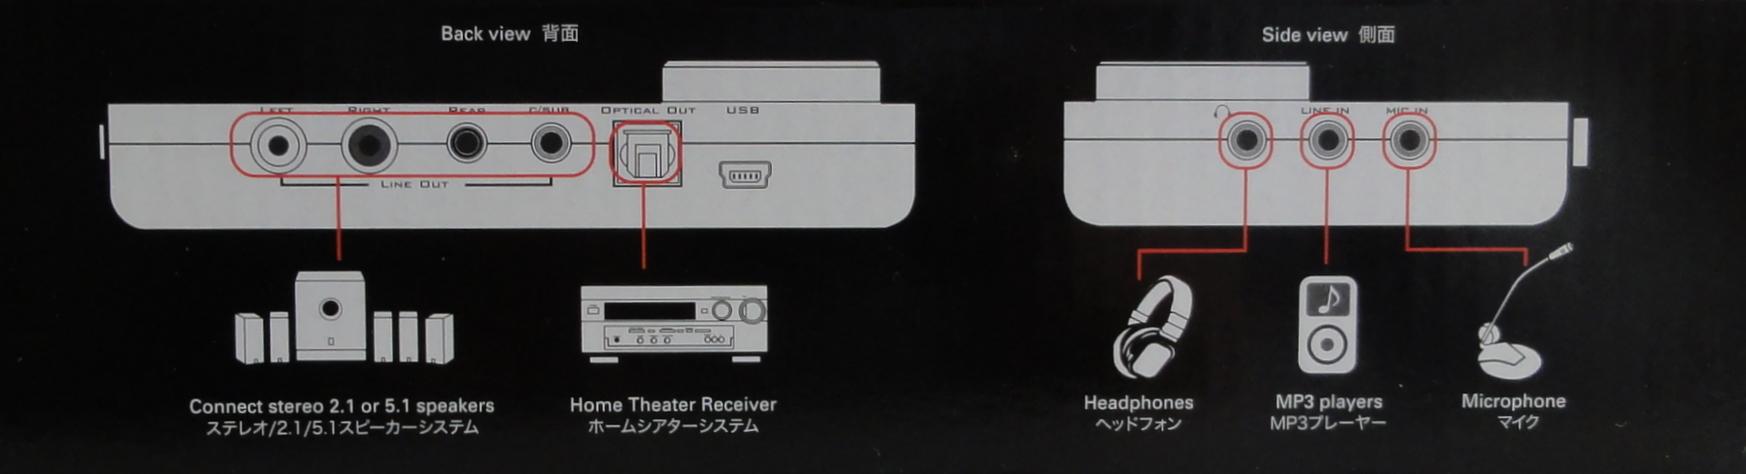 SB-XFI-SR51P connection